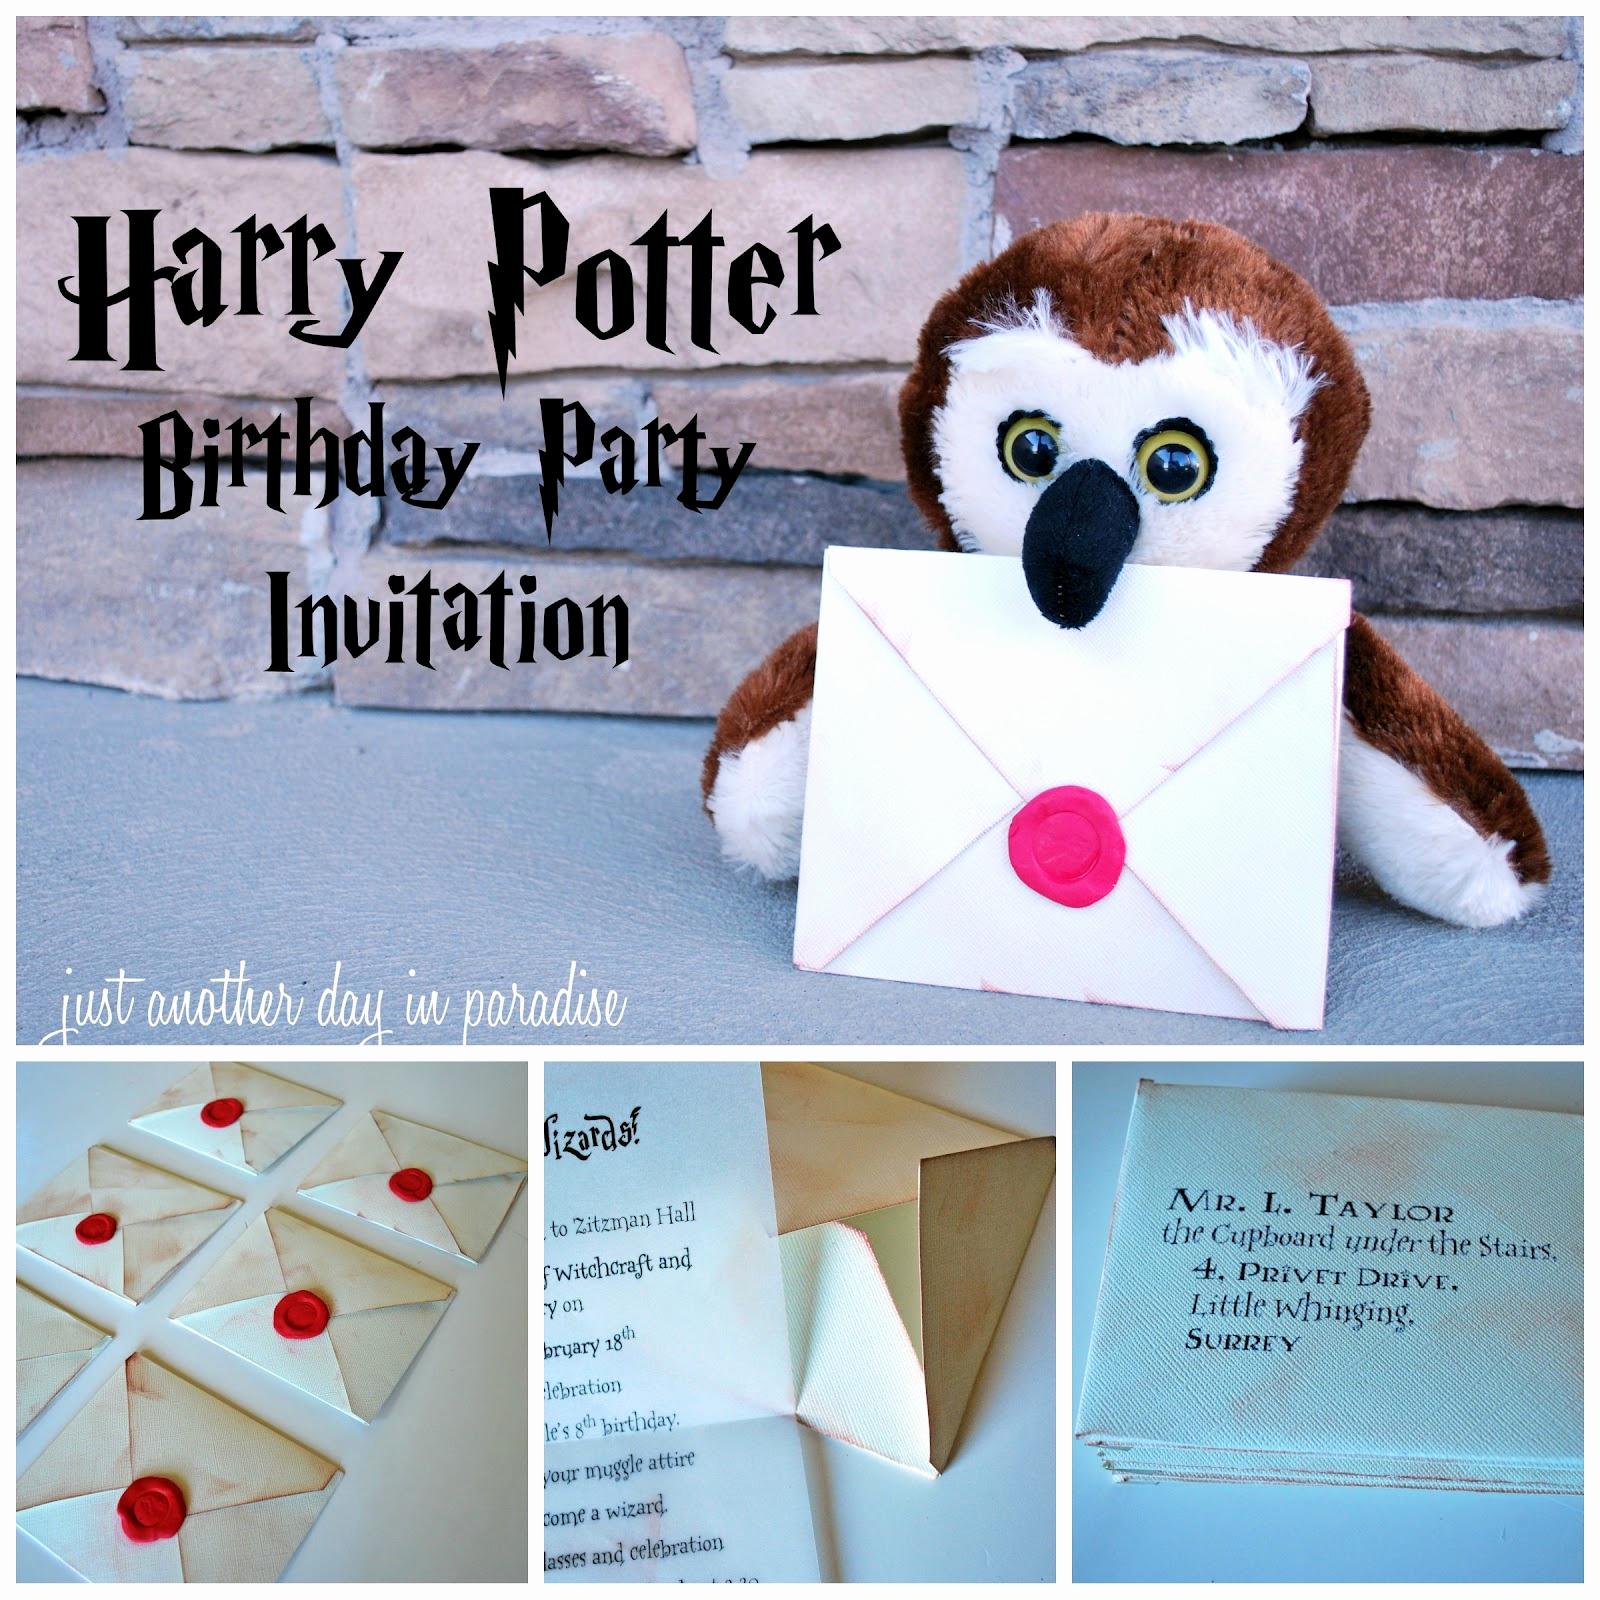 Harry Potter Birthday Party Invitation Lovely Larissa Another Day Harry Potter Party Invites Tutorial